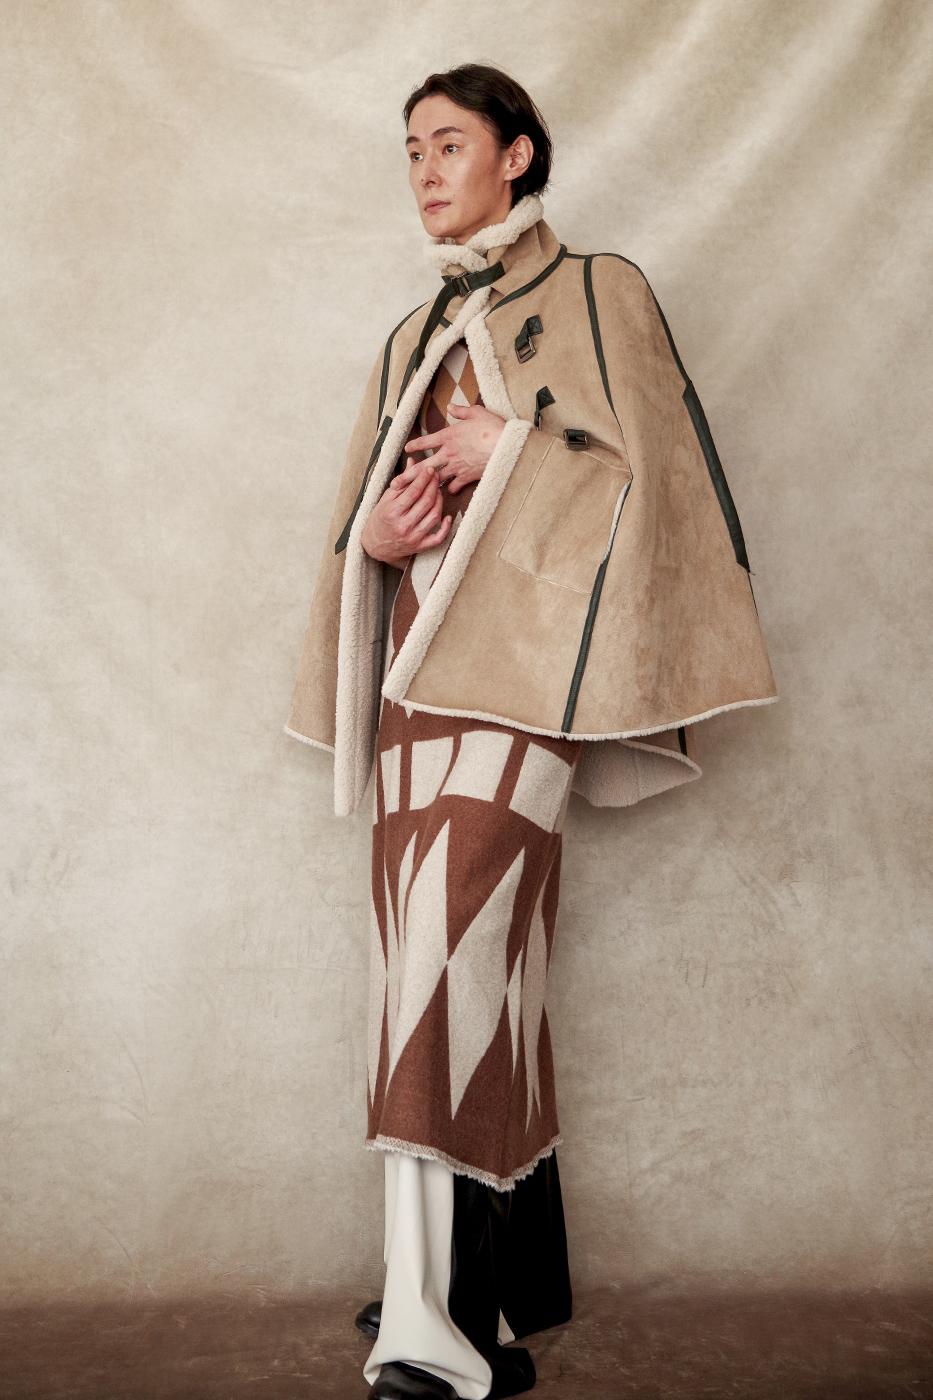 192003 Fake suede cape ¥73,000, 192015 Dress ¥40,000, 192065 Pants ¥26,000